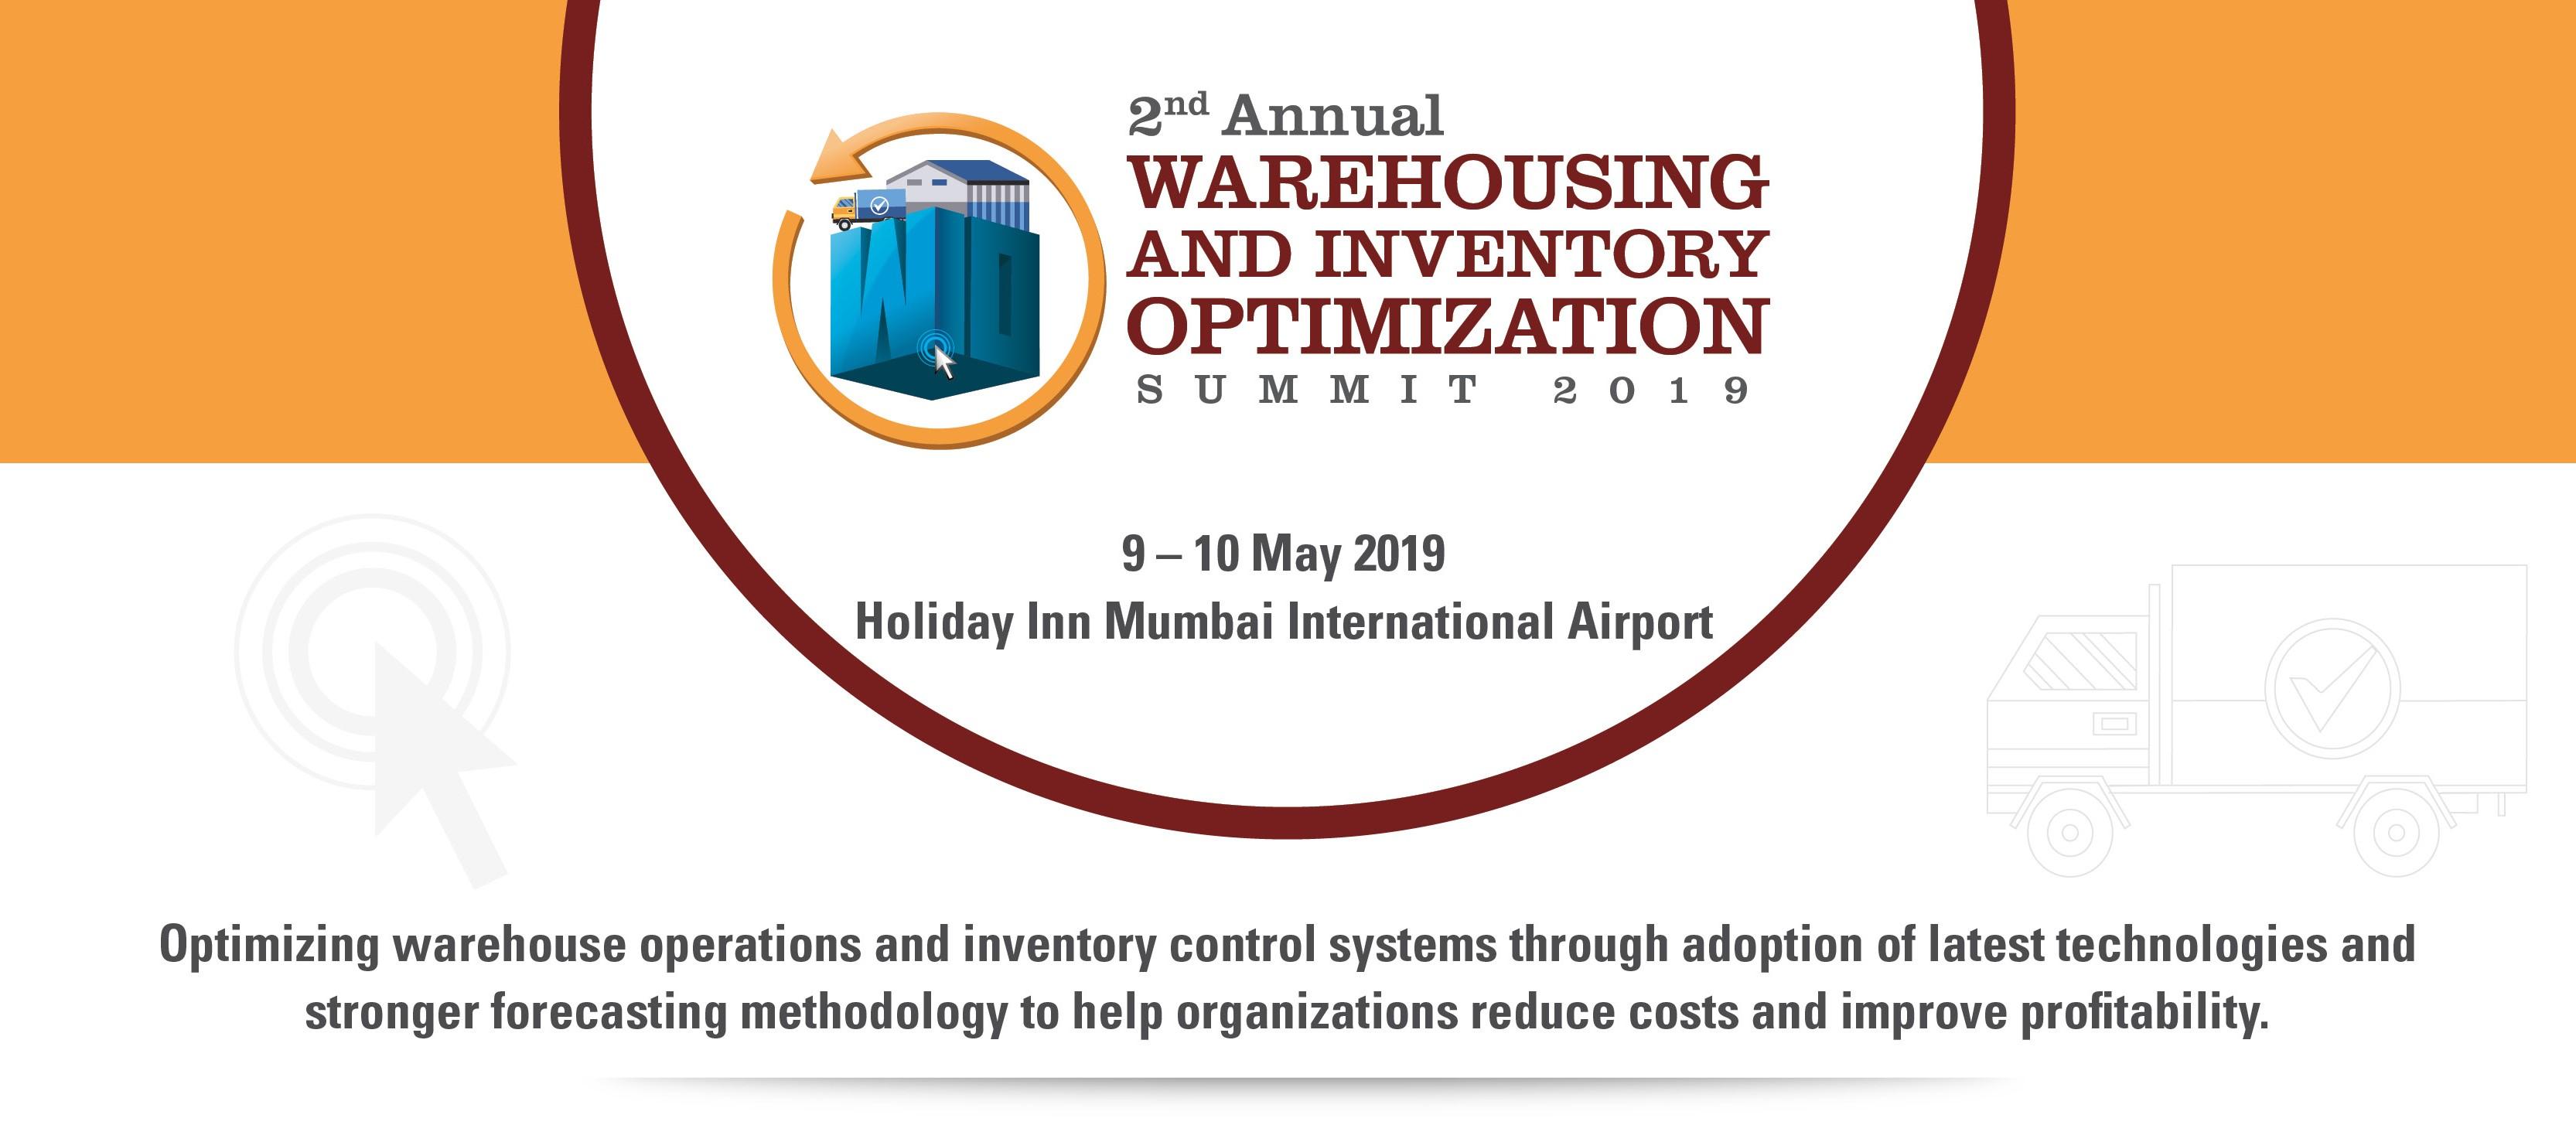 2nd ANNUAL WAREHOUSING AND INVENTORY OPTIMIZATION SUMMIT 2019, Mumbai, Maharashtra, India